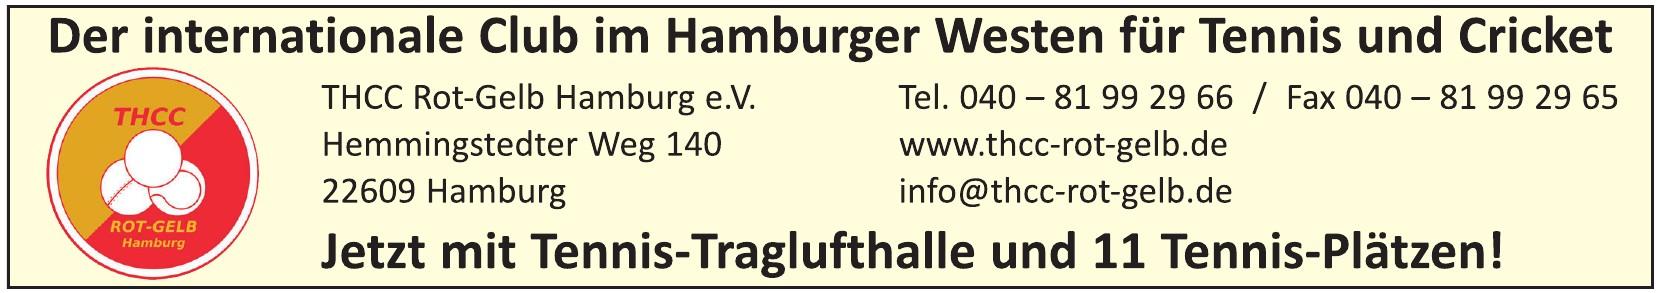 THCC Rot-Gelb Hamburg e.V.